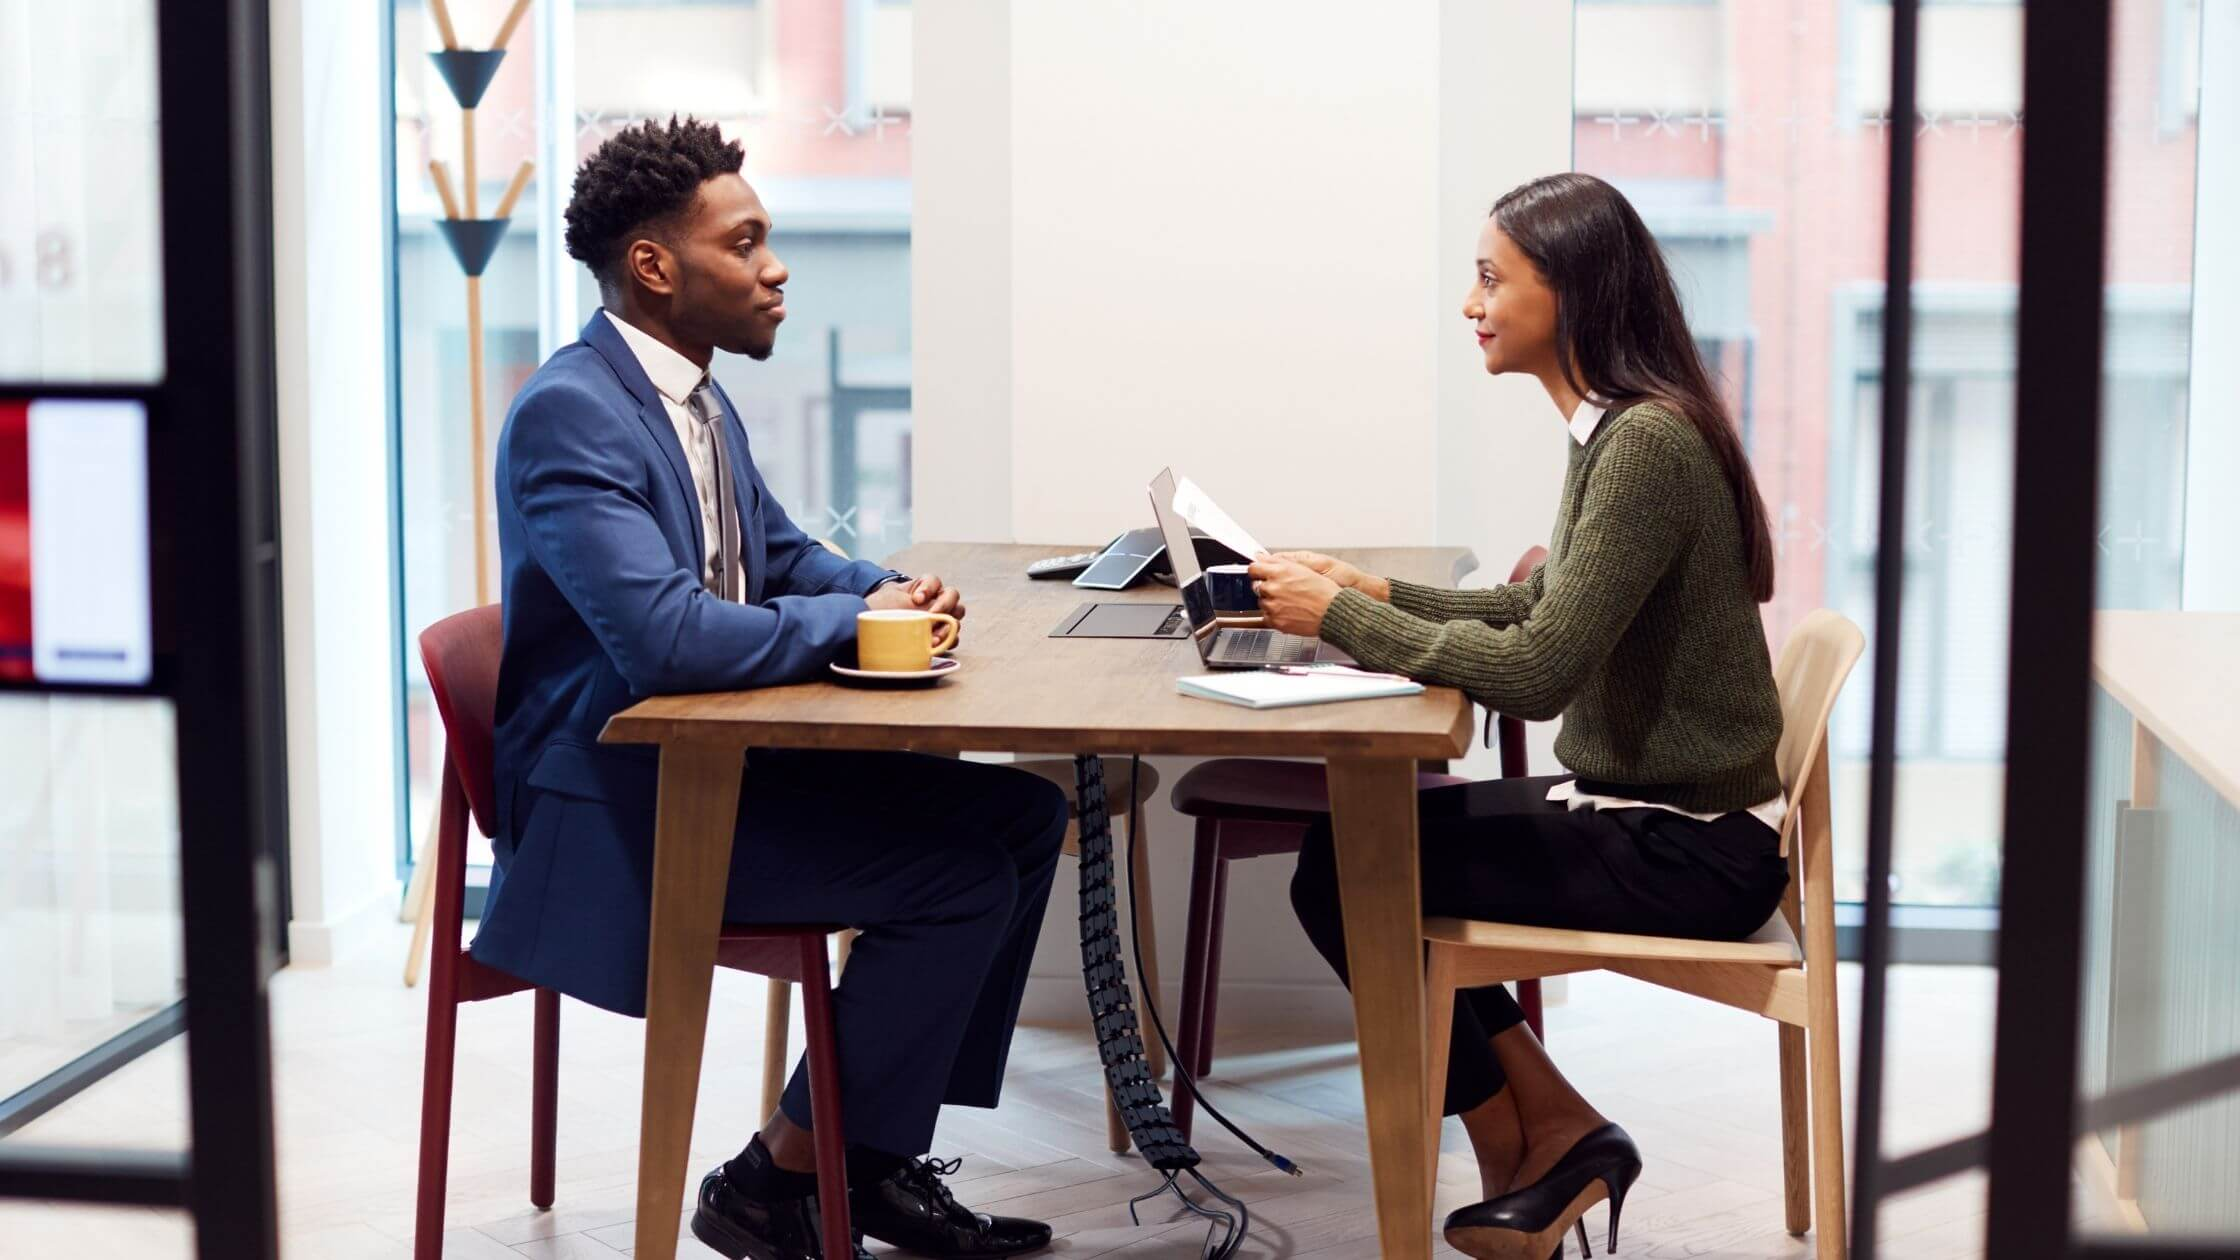 10 Unique Interview Questions to Invigorate Your Recruitment Process